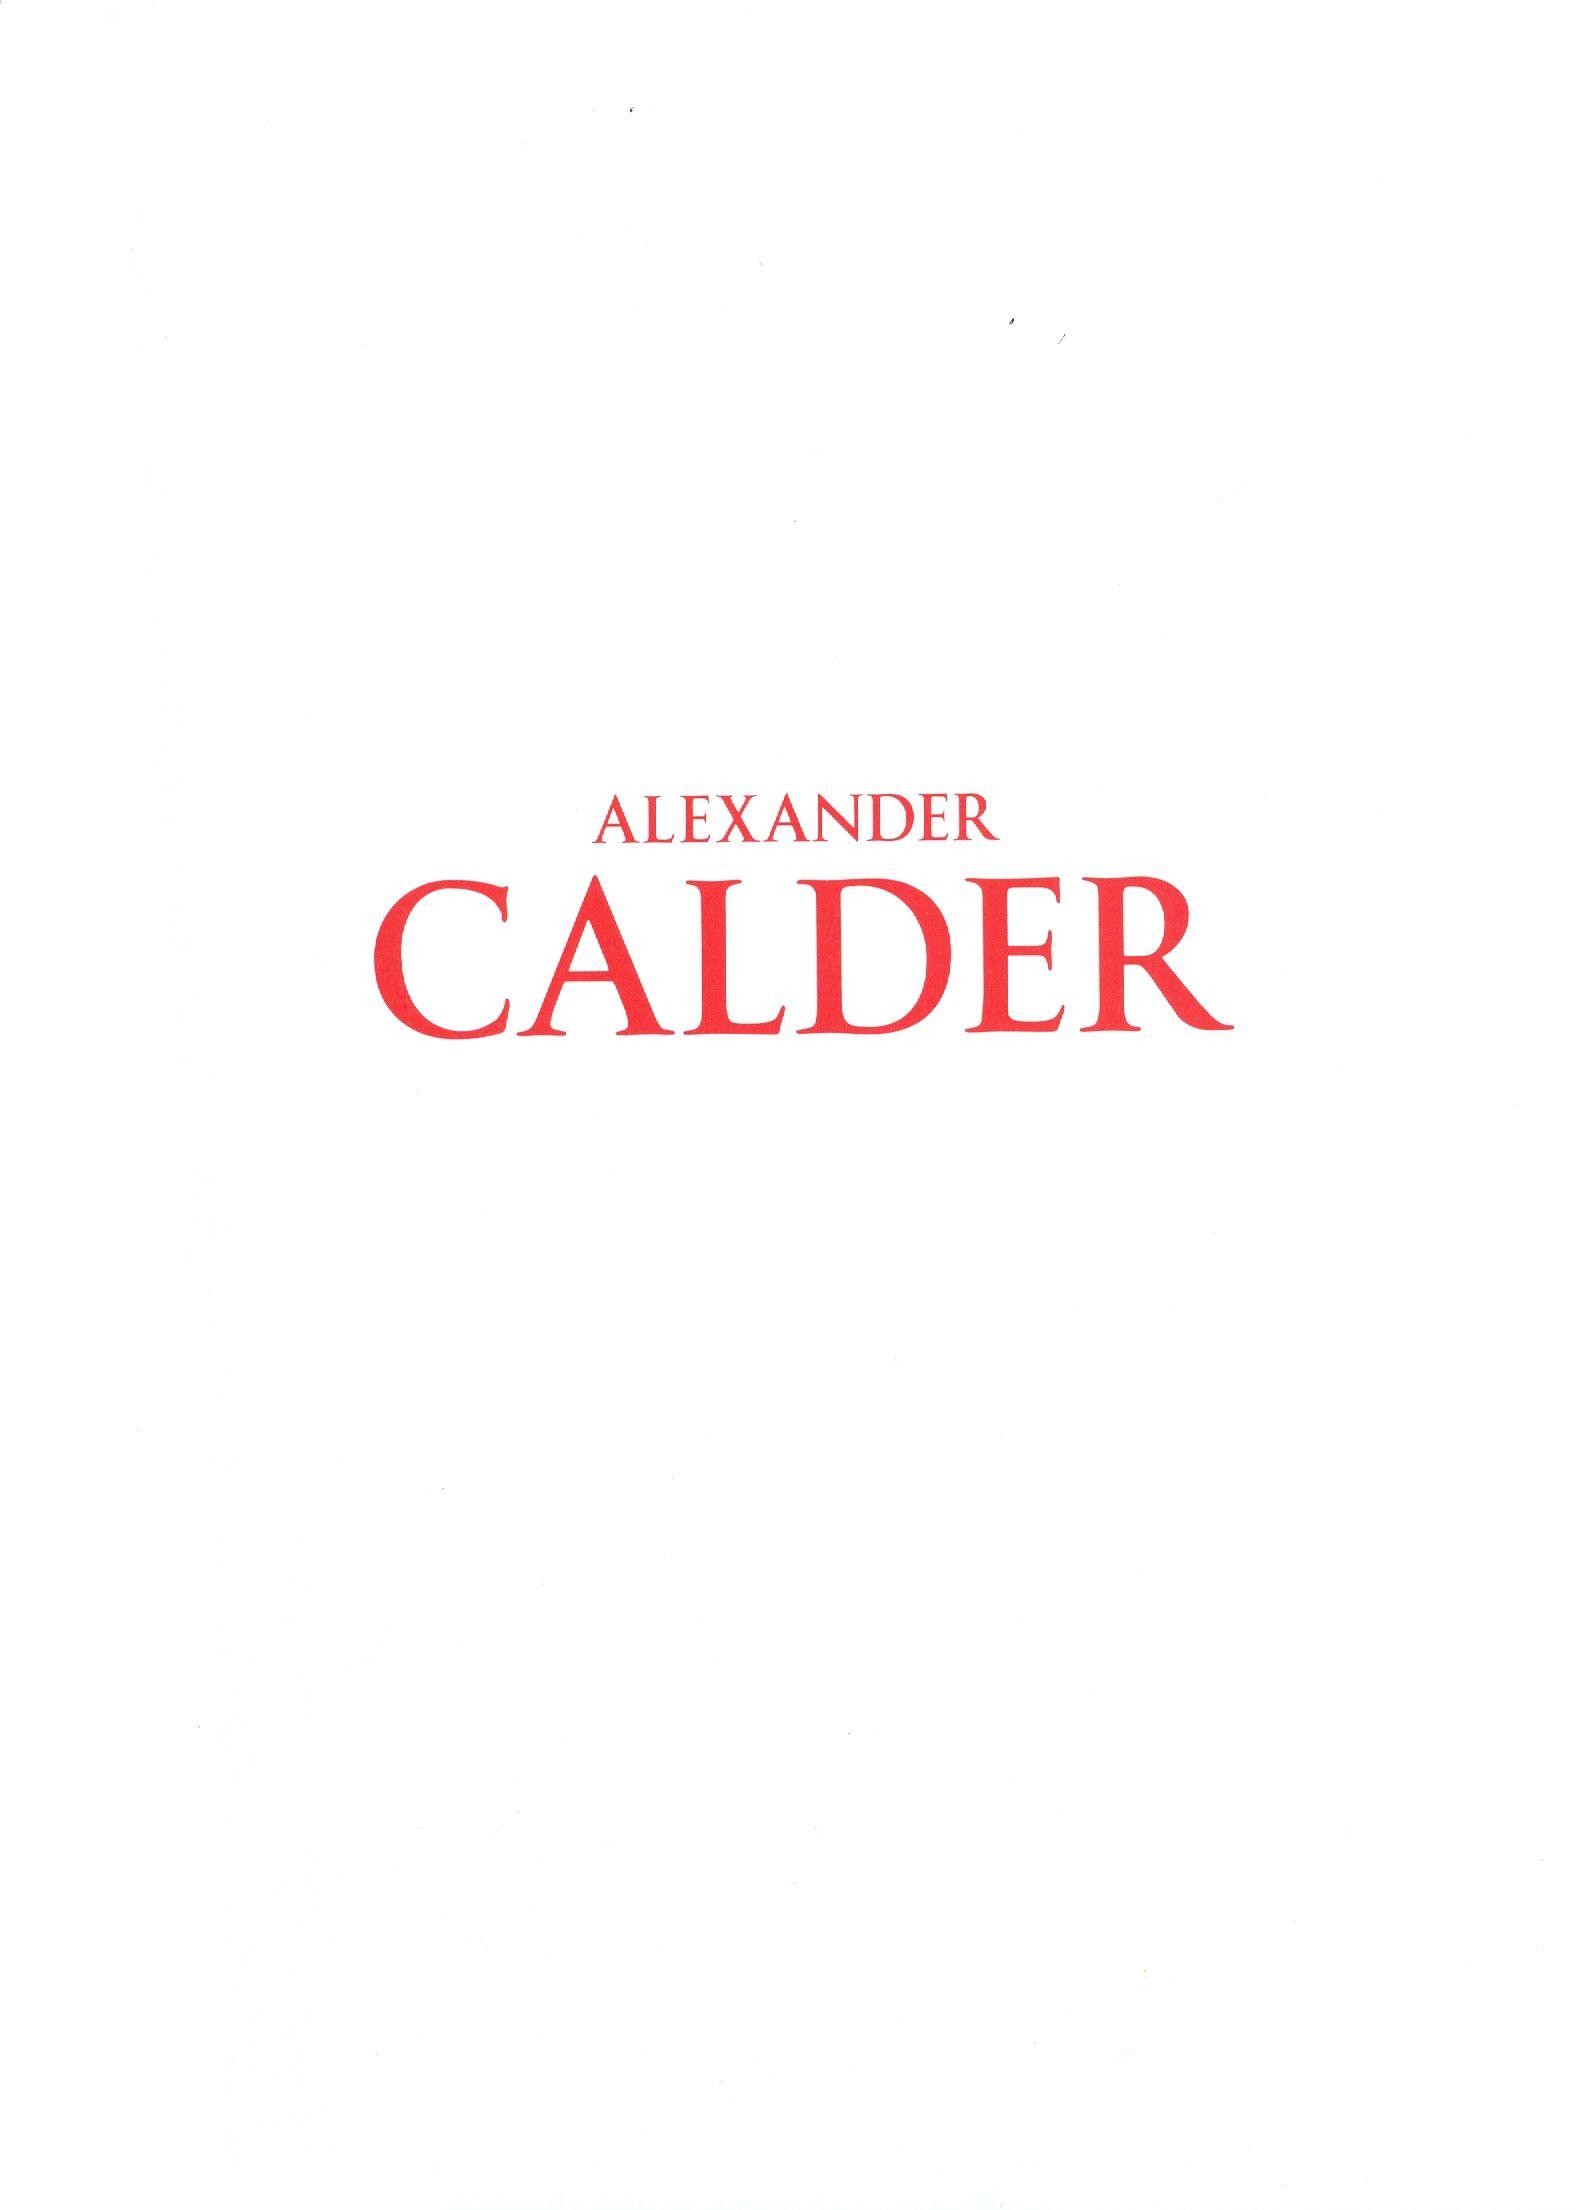 A_Calder_katalog_naslovnica